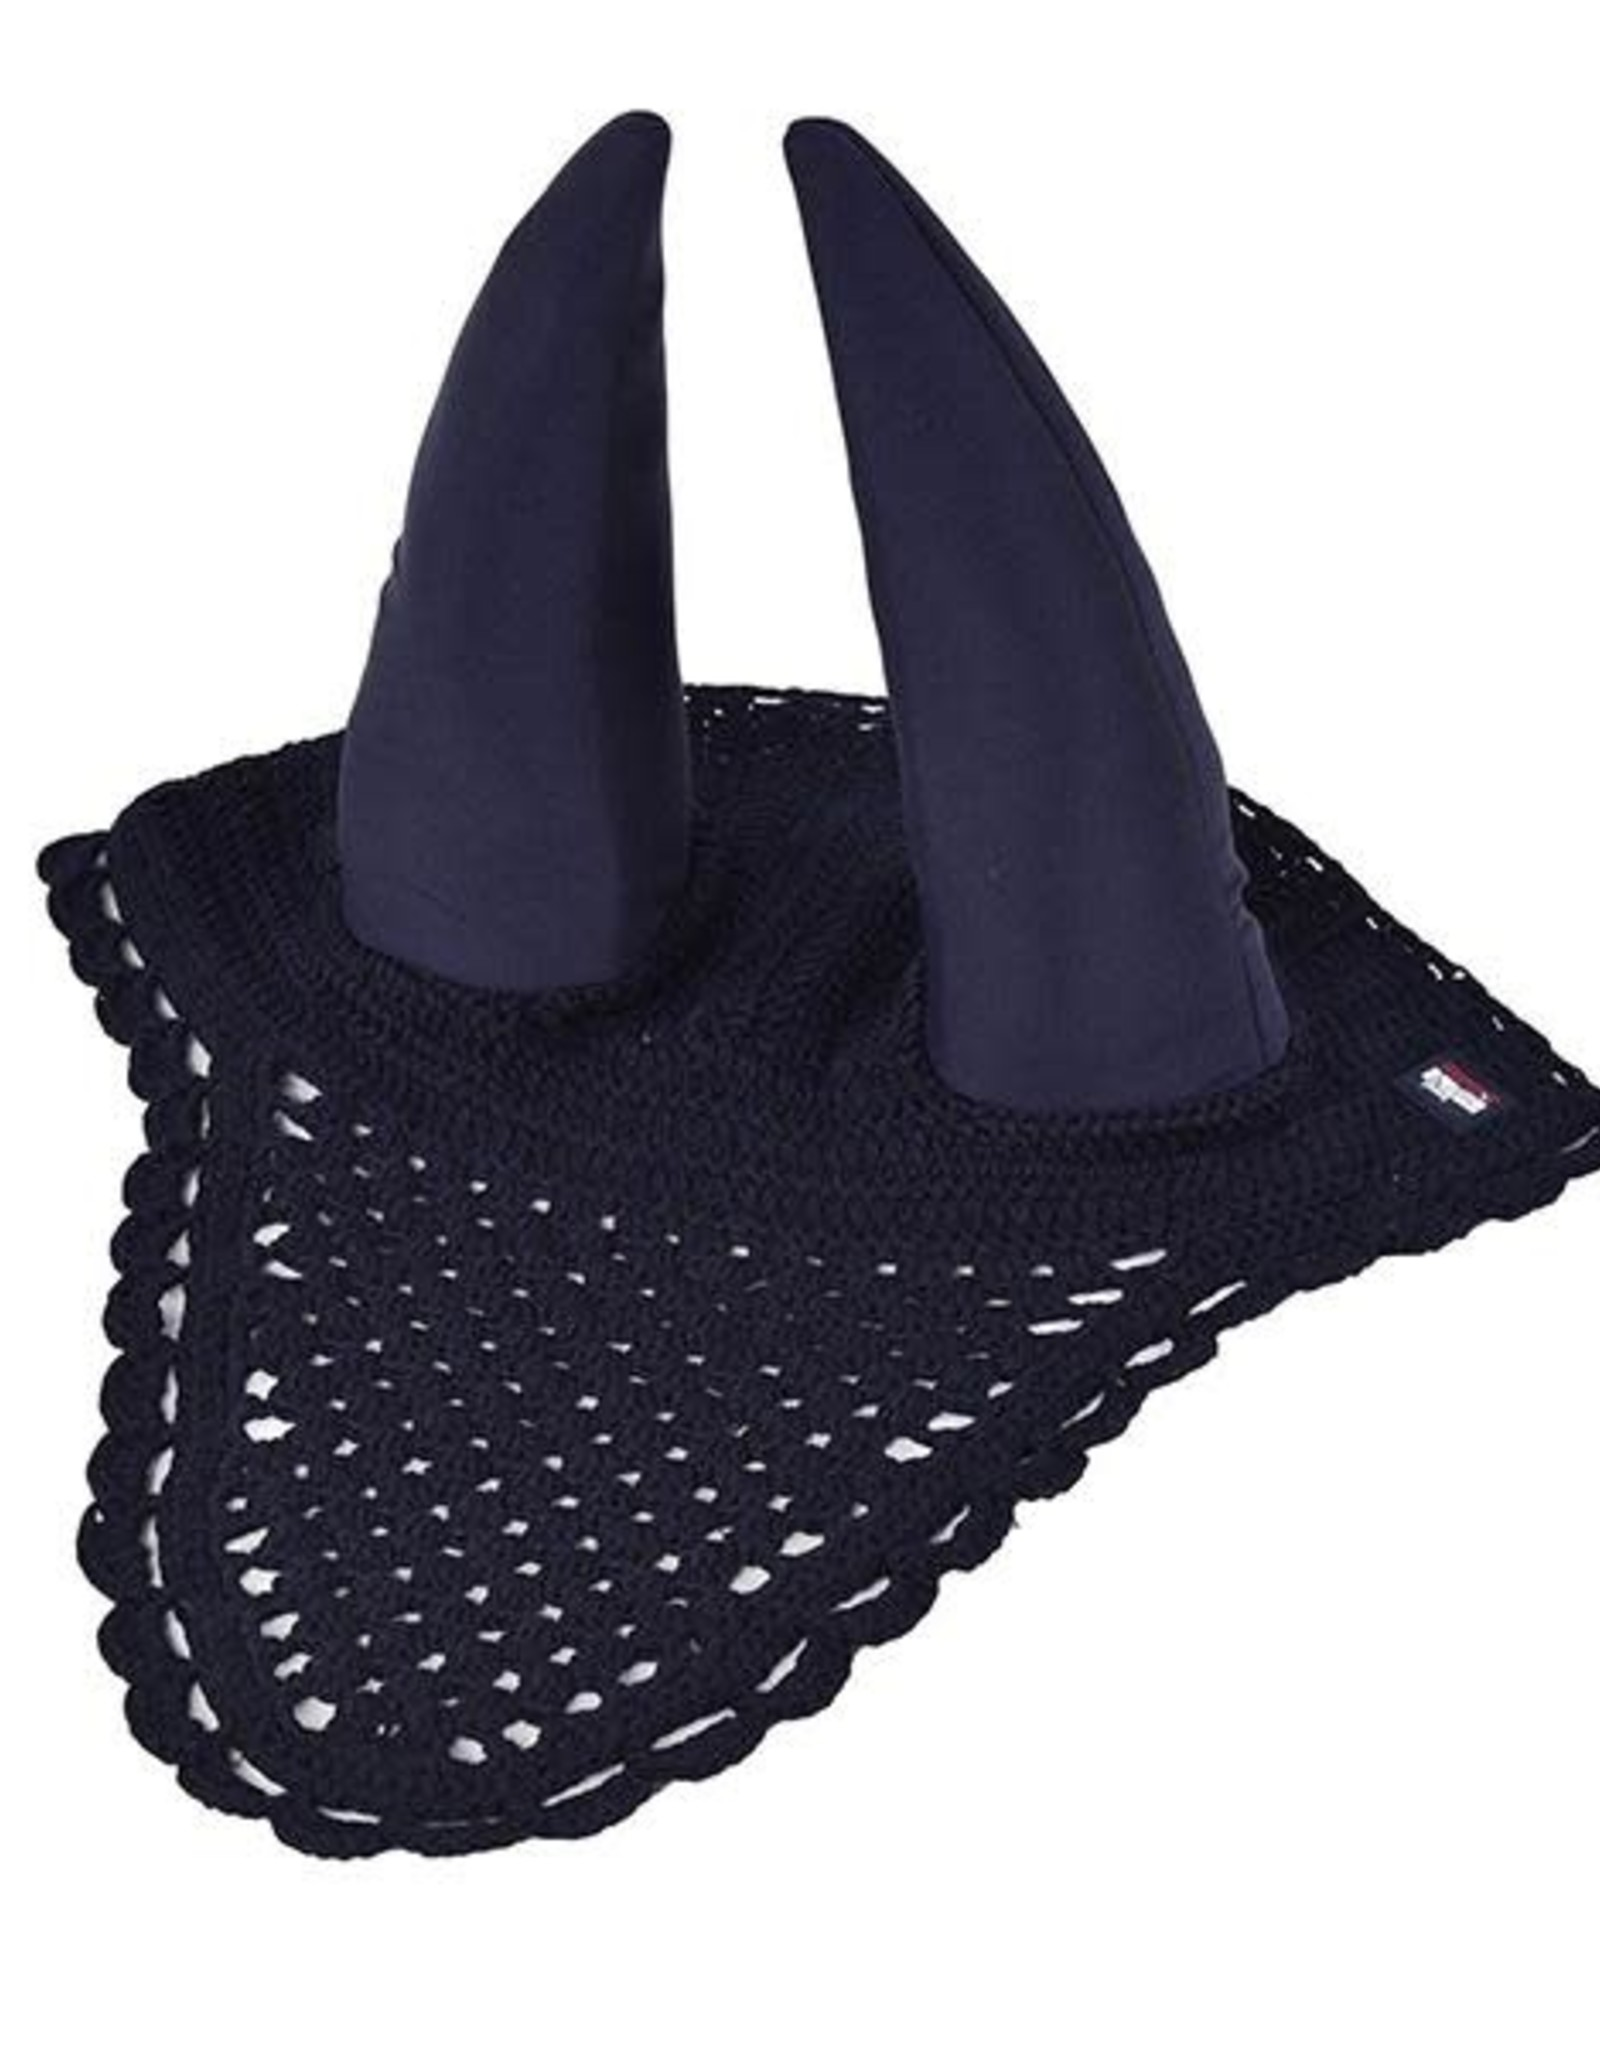 Kingsland KL Classic noiseless fly hat navy